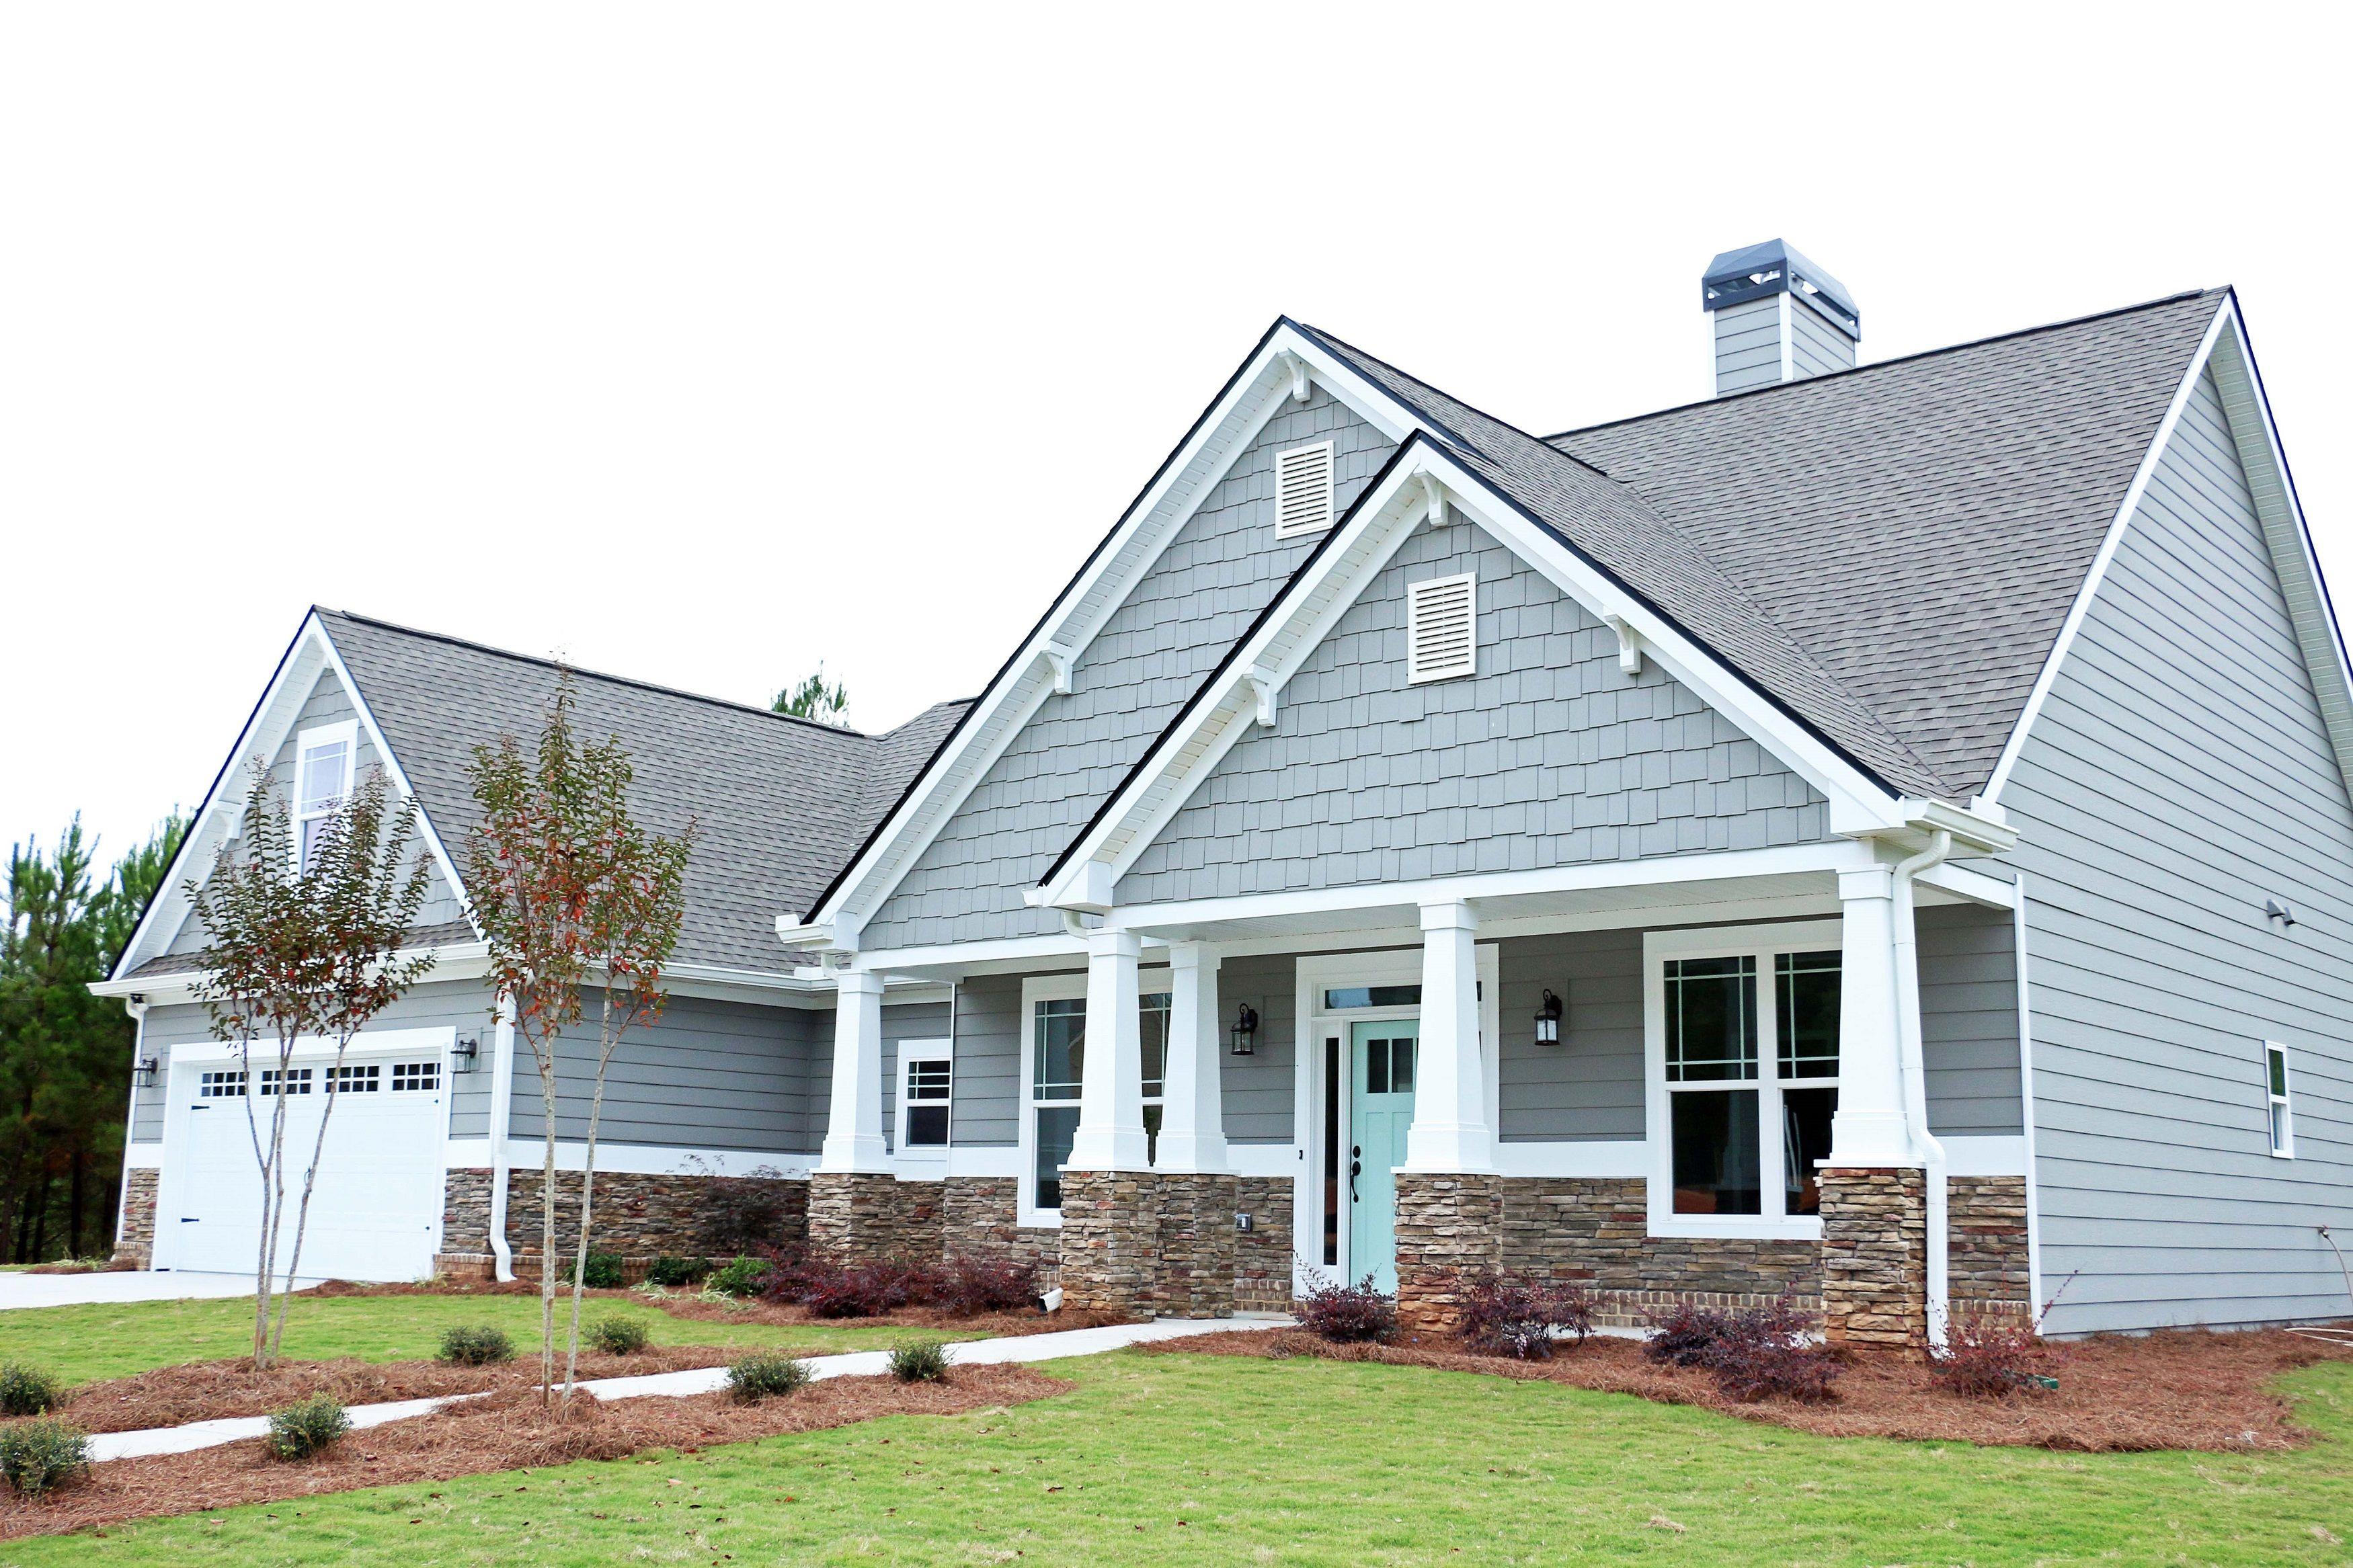 Home sweet home exterior exterior house colors house - Sherwin williams artichoke exterior ...